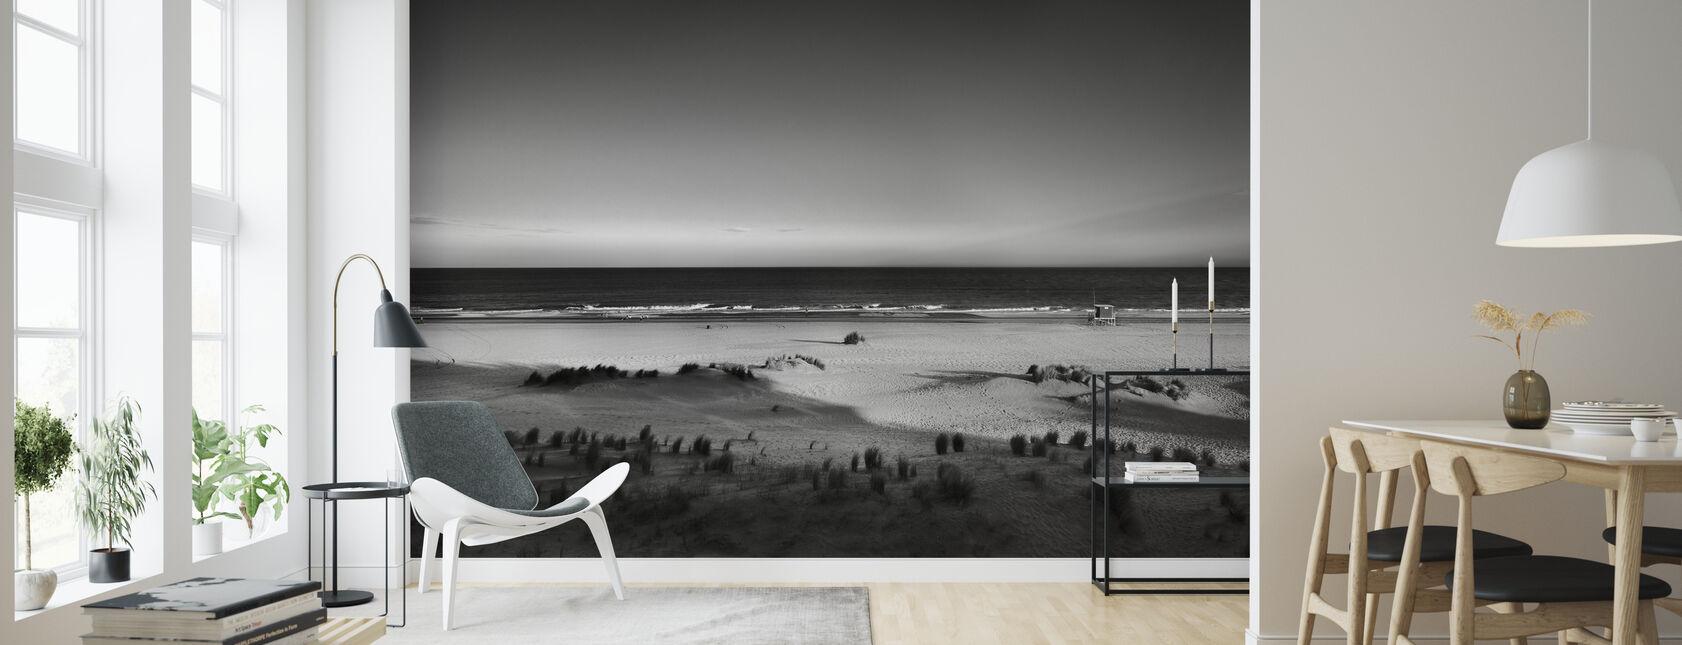 Beach in Argentina - Wallpaper - Living Room